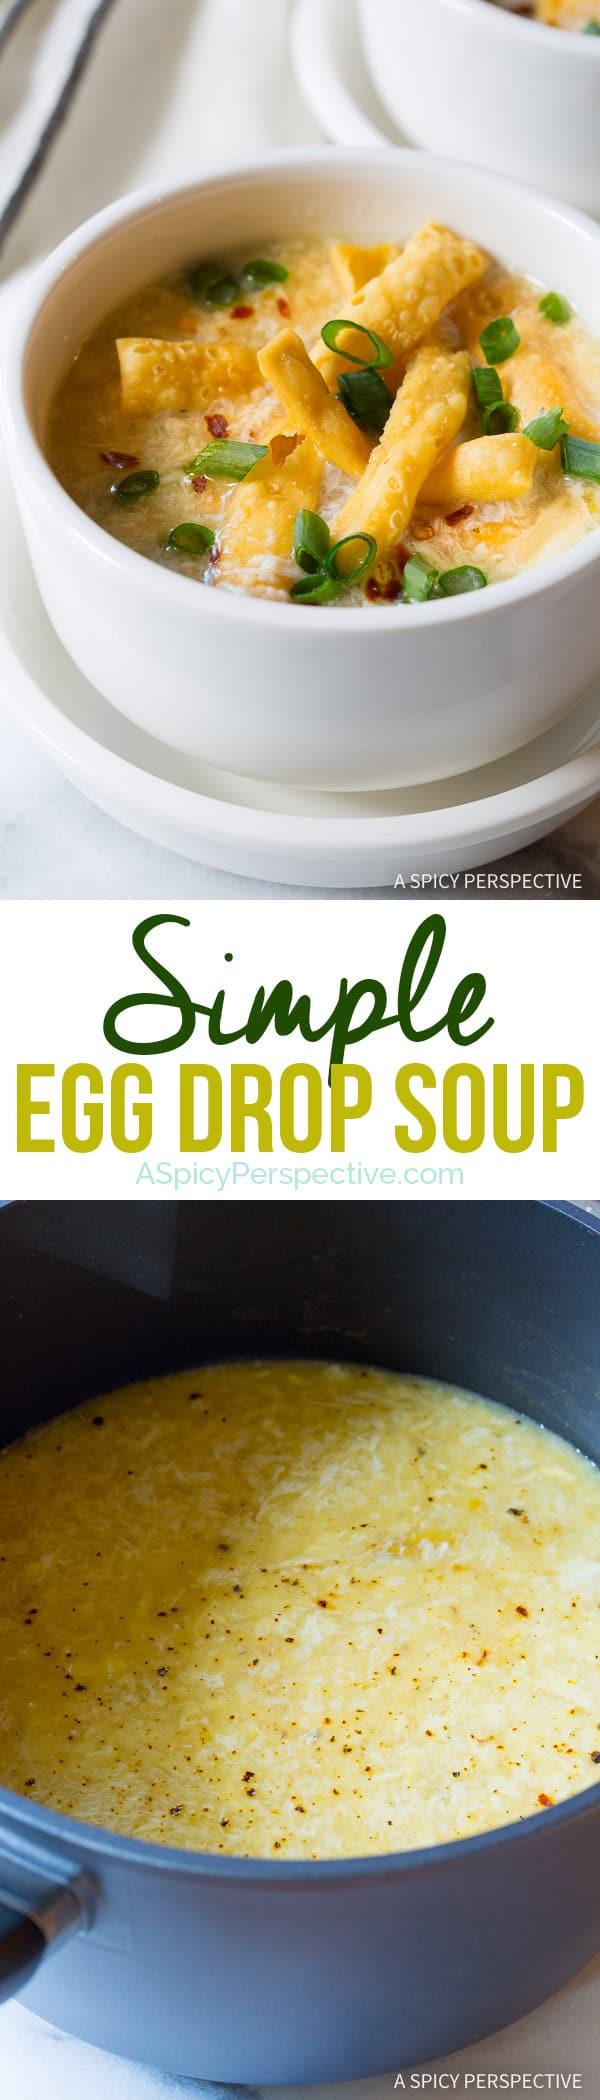 The Best Egg Drop Soup Recipe | ASpicyPerspective.com